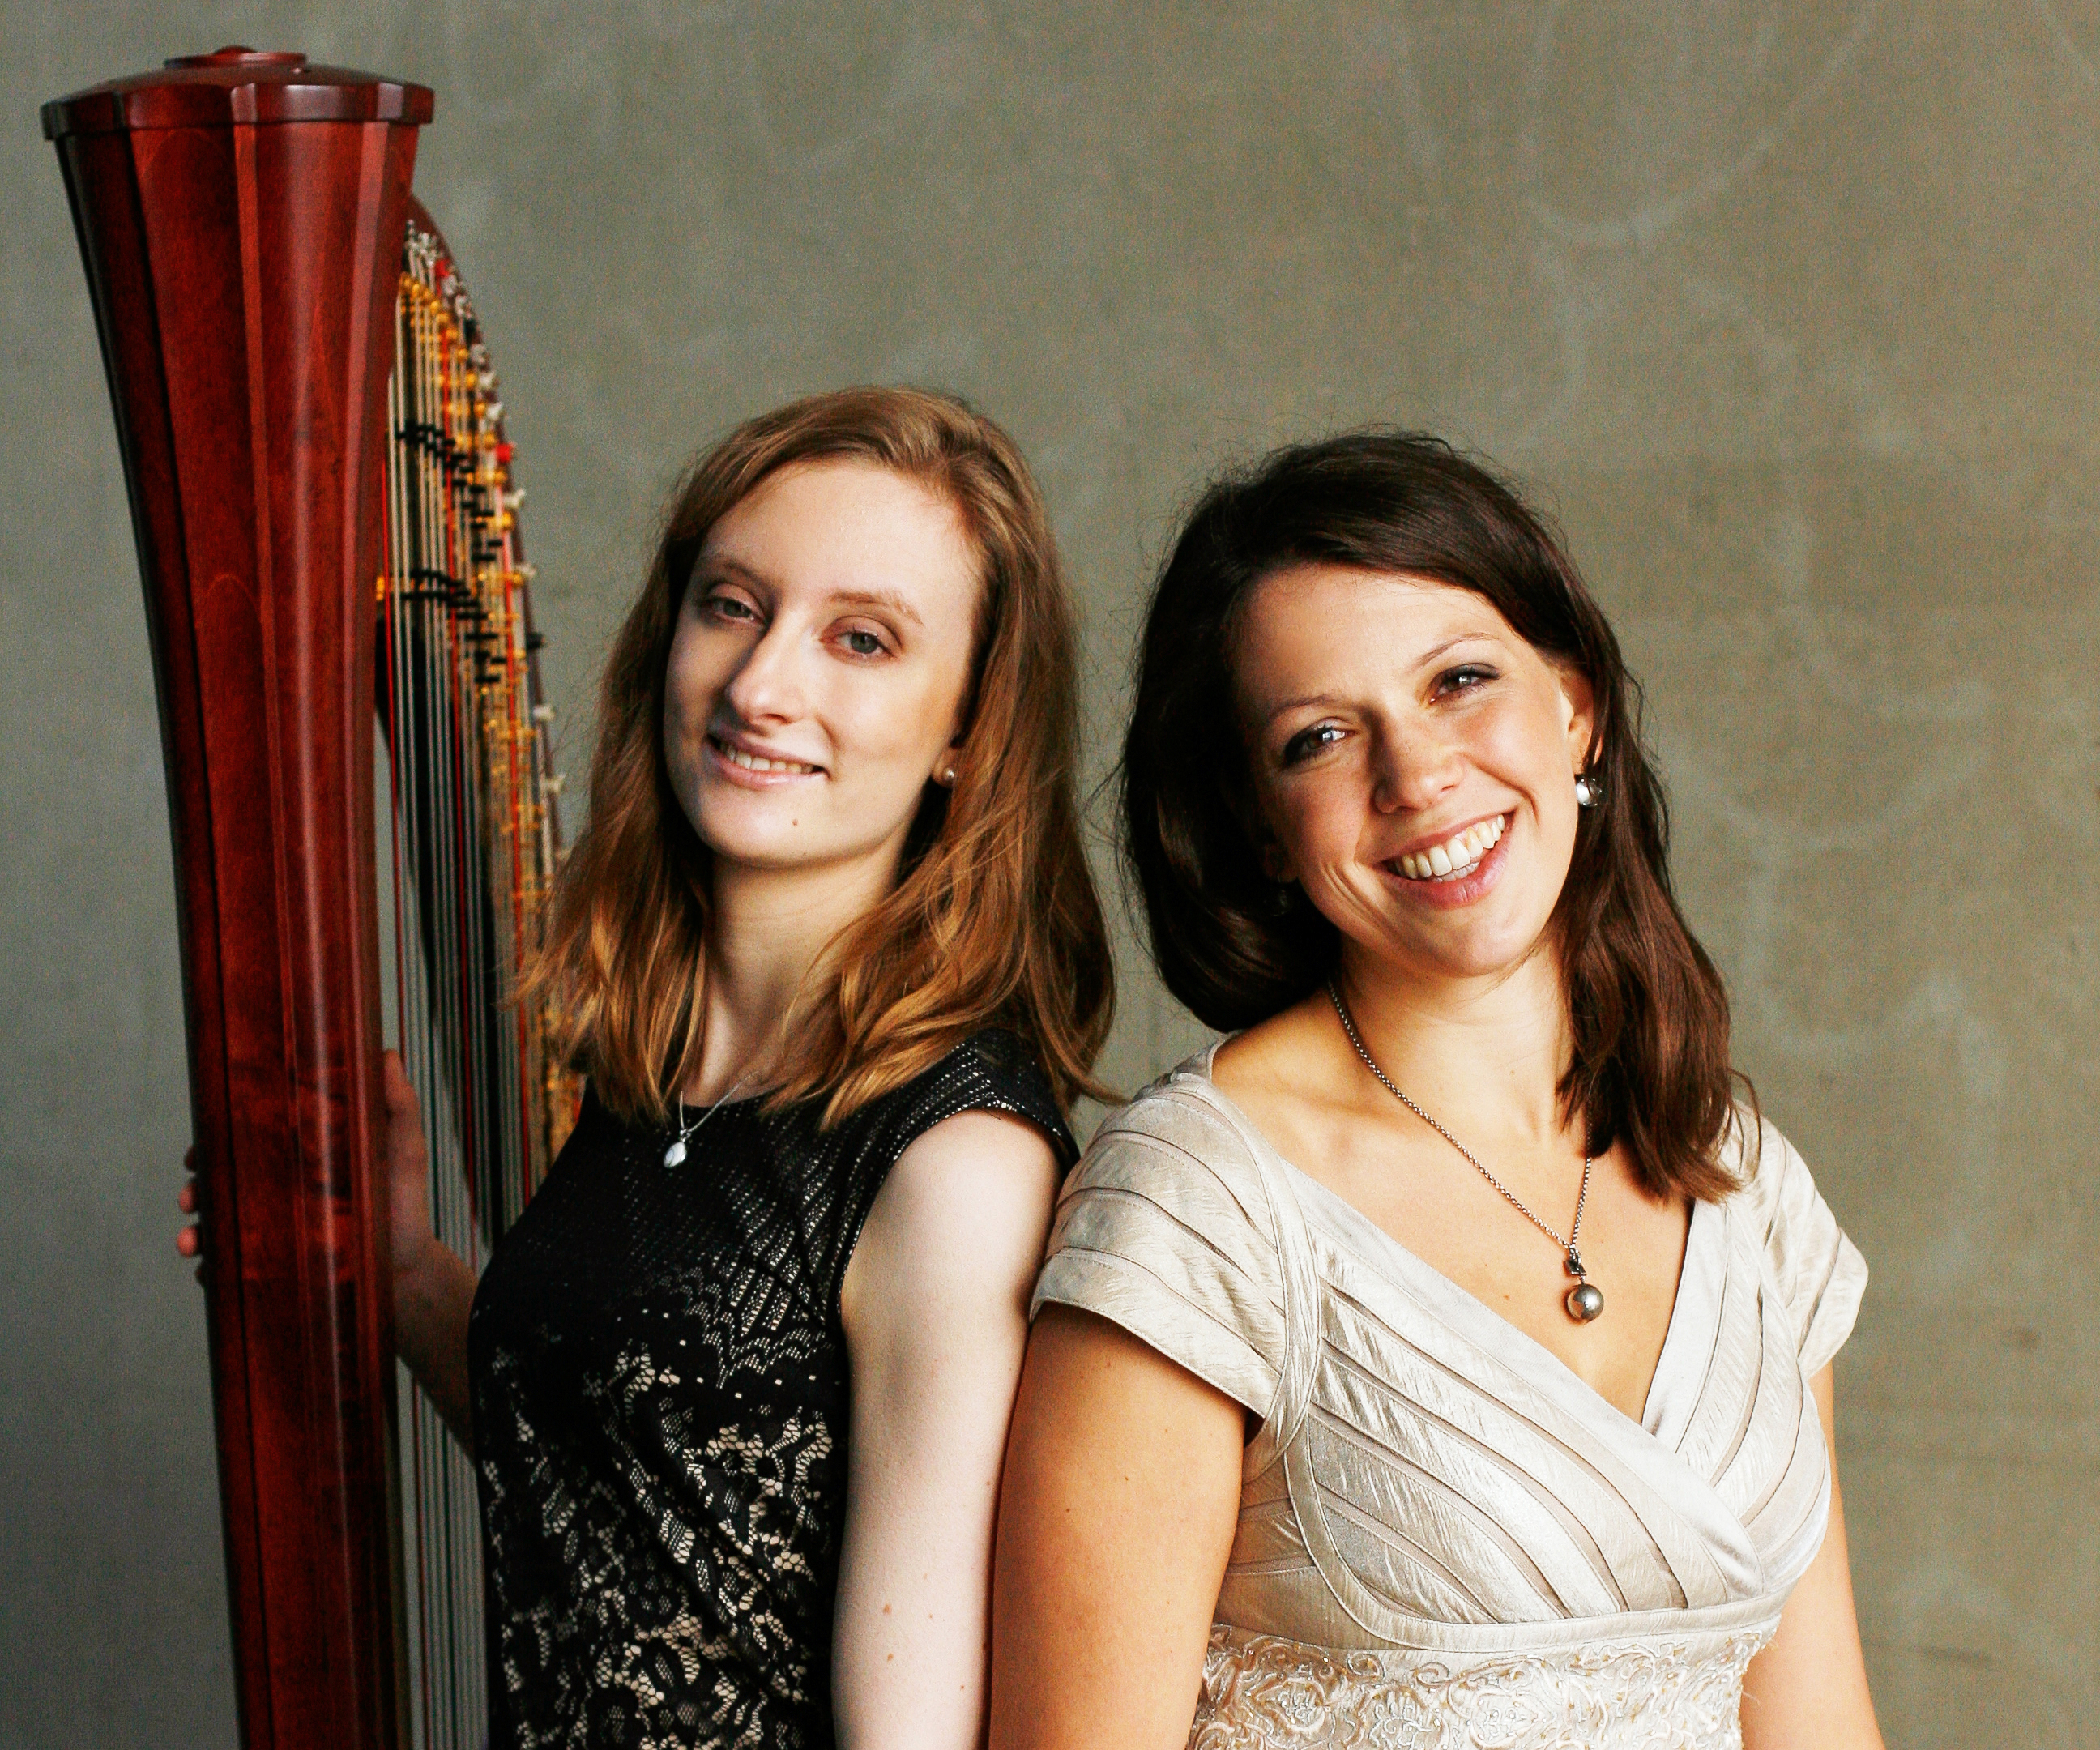 Canta Orpheo Duo Sopraninstin Elisabeth Menke und Harfinistin Christina Buchsbaum